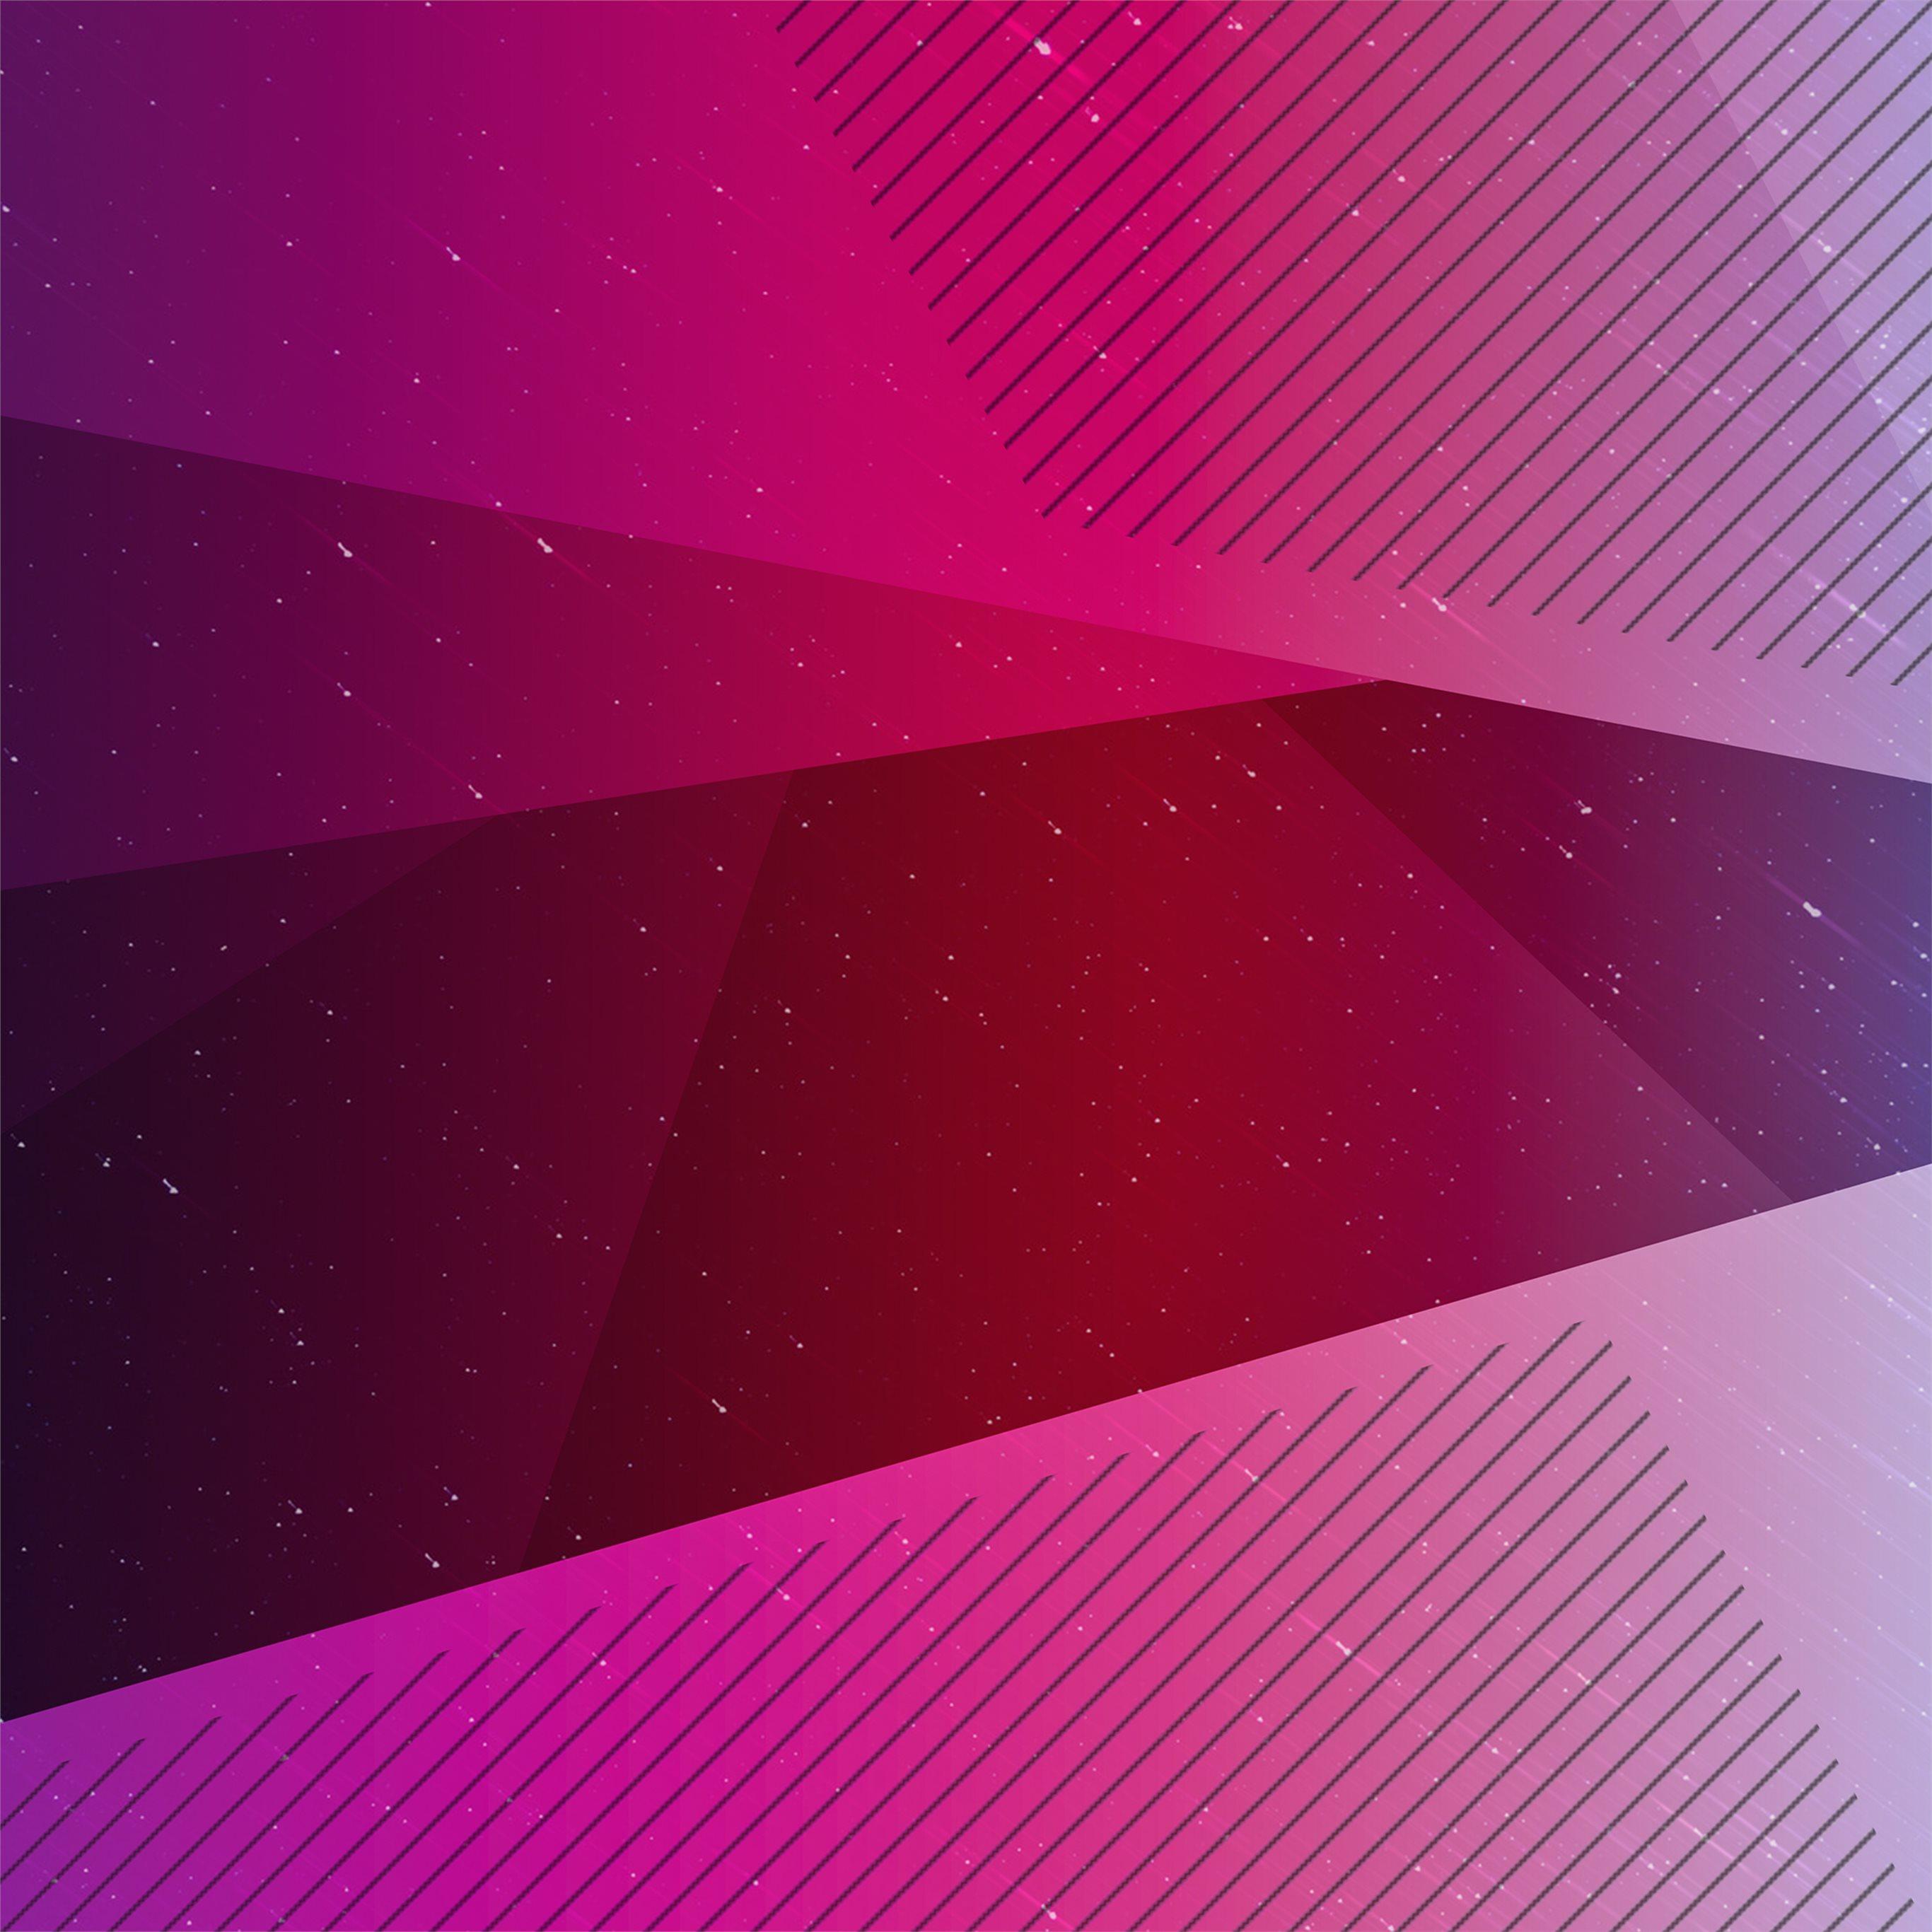 Minimal Abstract 4k IPad Wallpapers Free Download